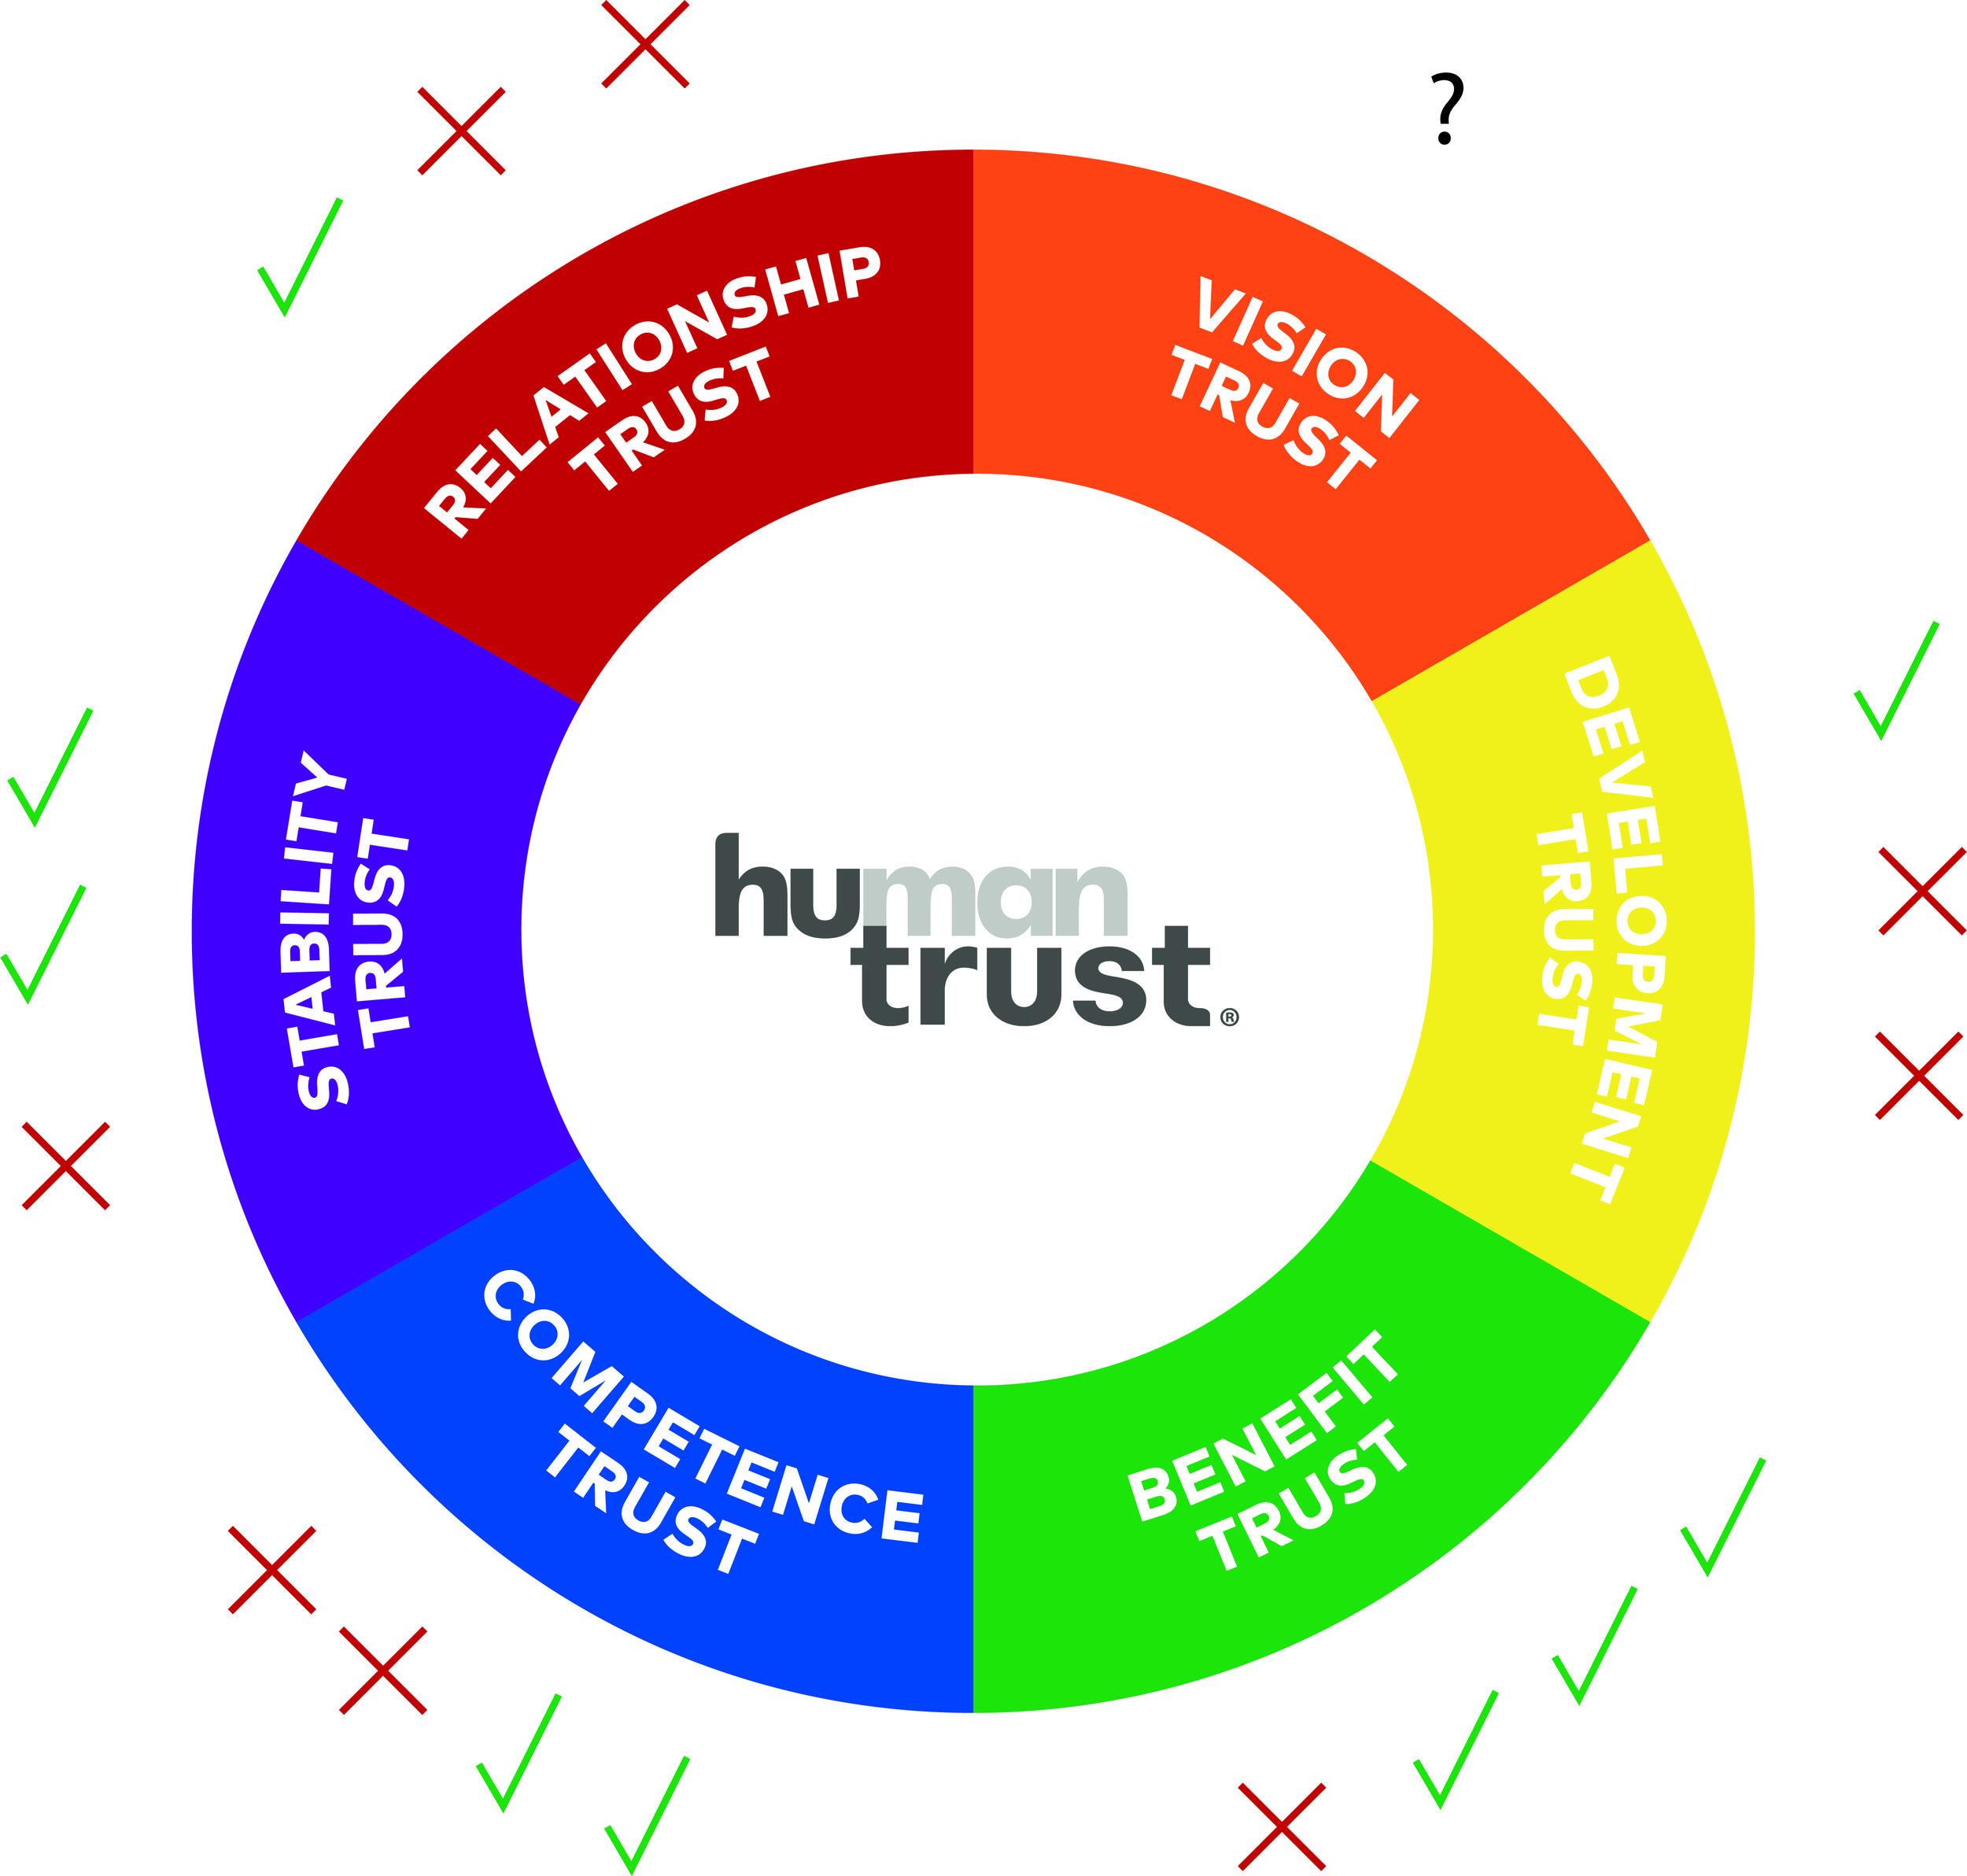 Mext_Consulting_Firm_Melbourne_Trust_HuTrust_Model_Human_Trust_Tick_Cross.jpg